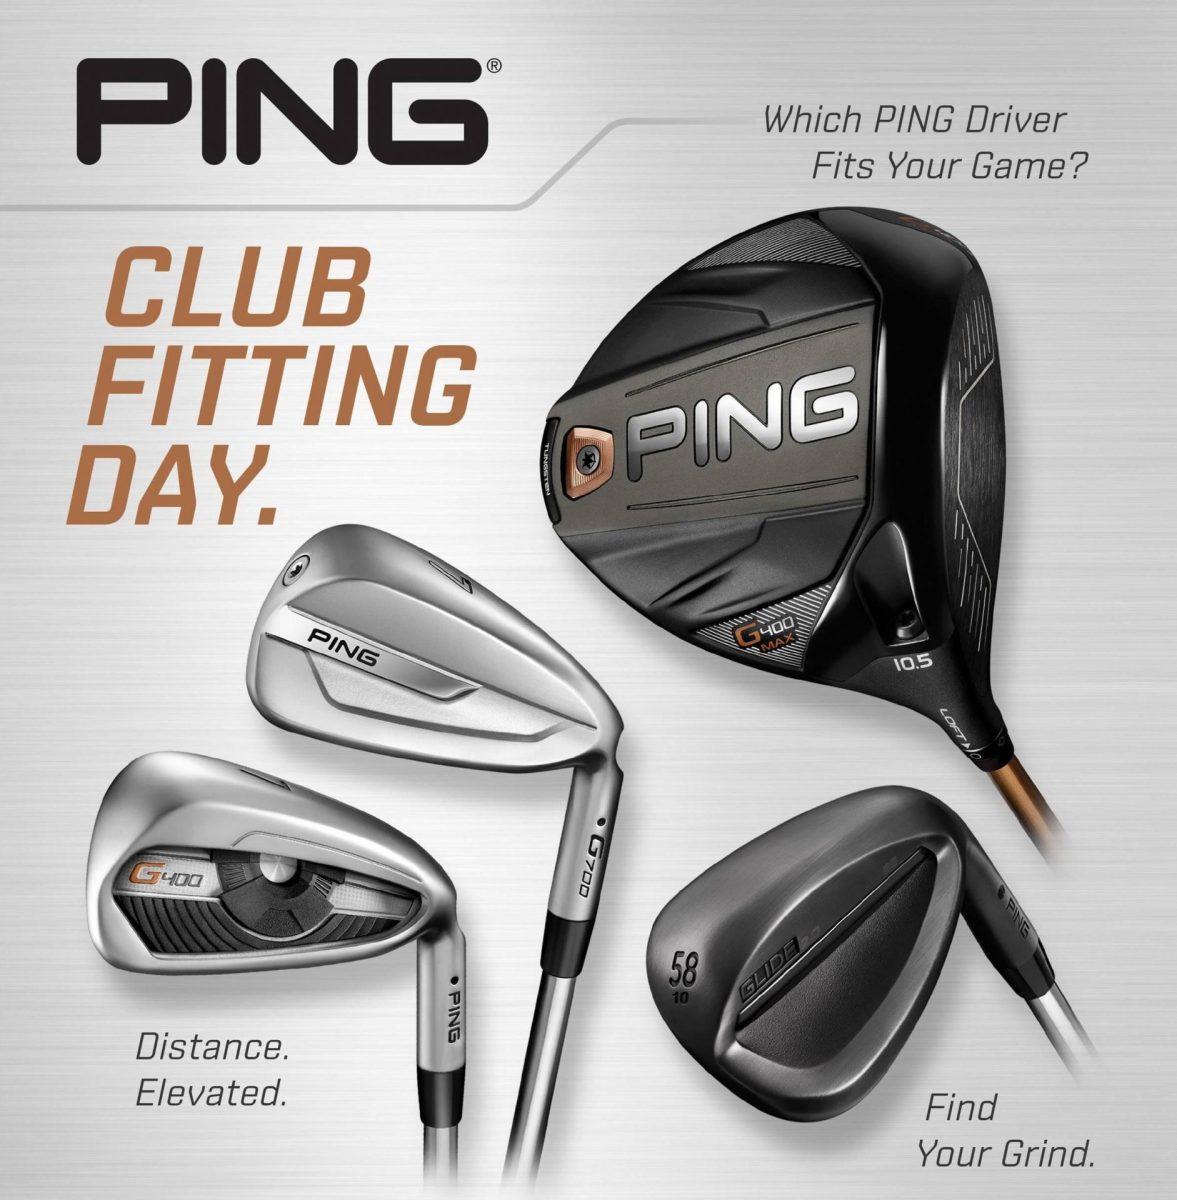 PING Golf Club Fitting